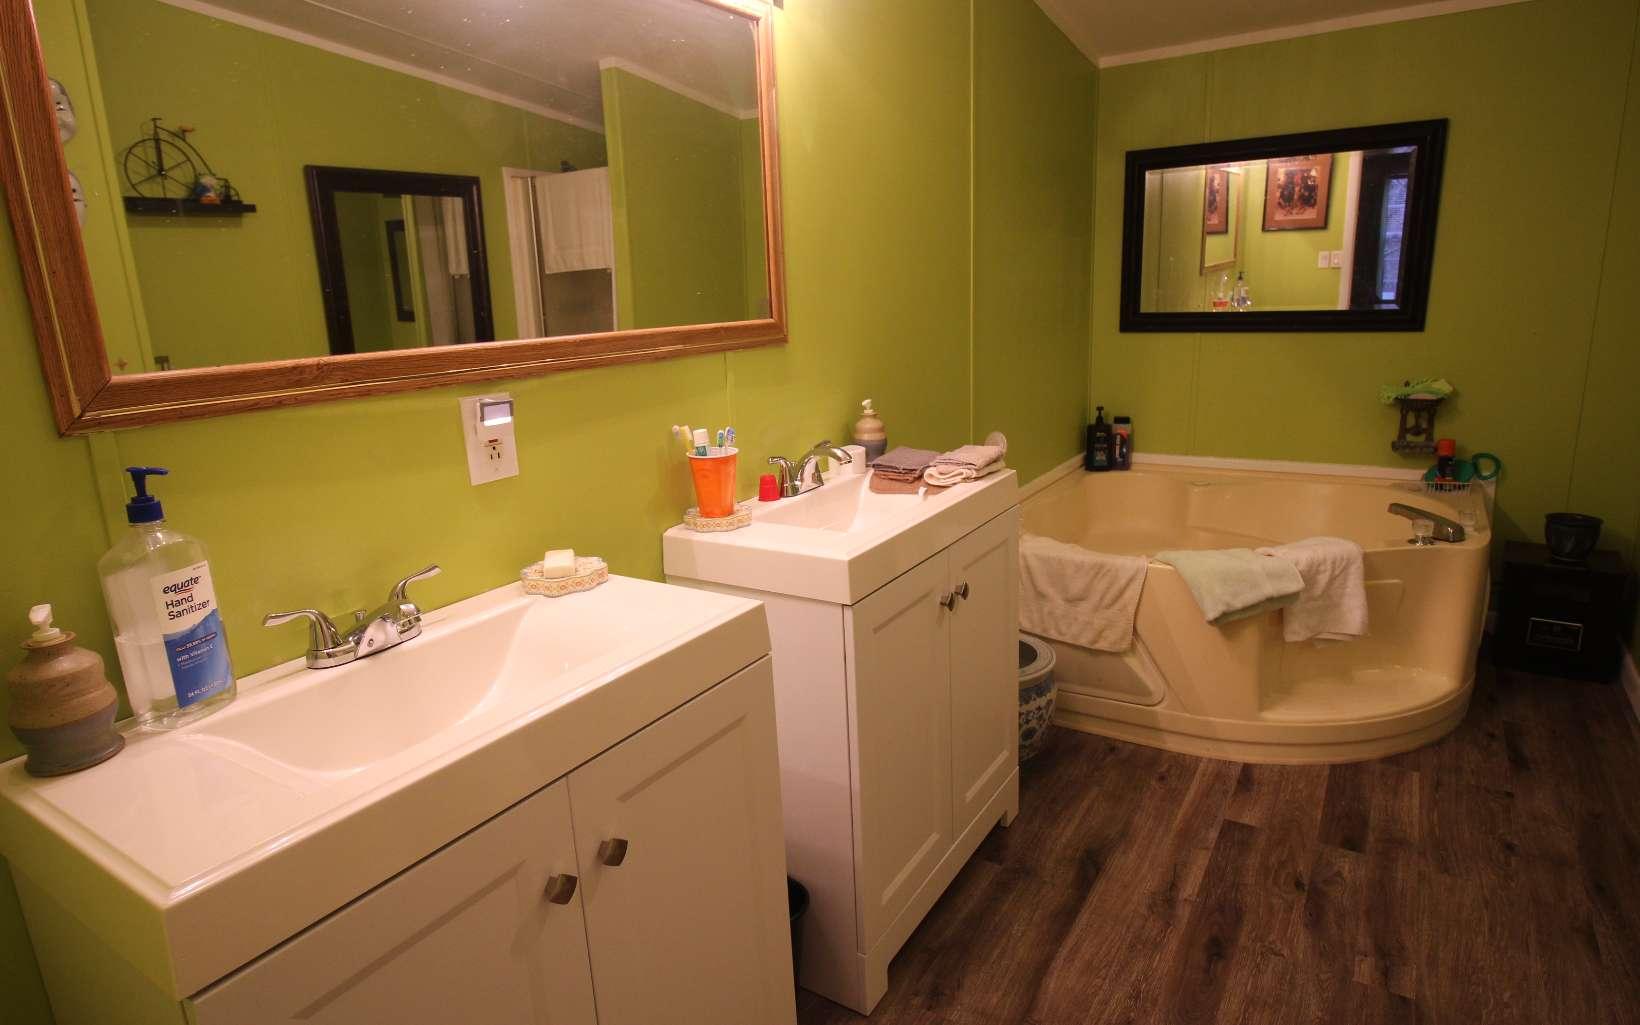 807 BANKS ROAD, Ellijay, Georgia 30540, 4 Bedrooms Bedrooms, ,2 BathroomsBathrooms,Single Family,For Sale,807 BANKS ROAD,305231